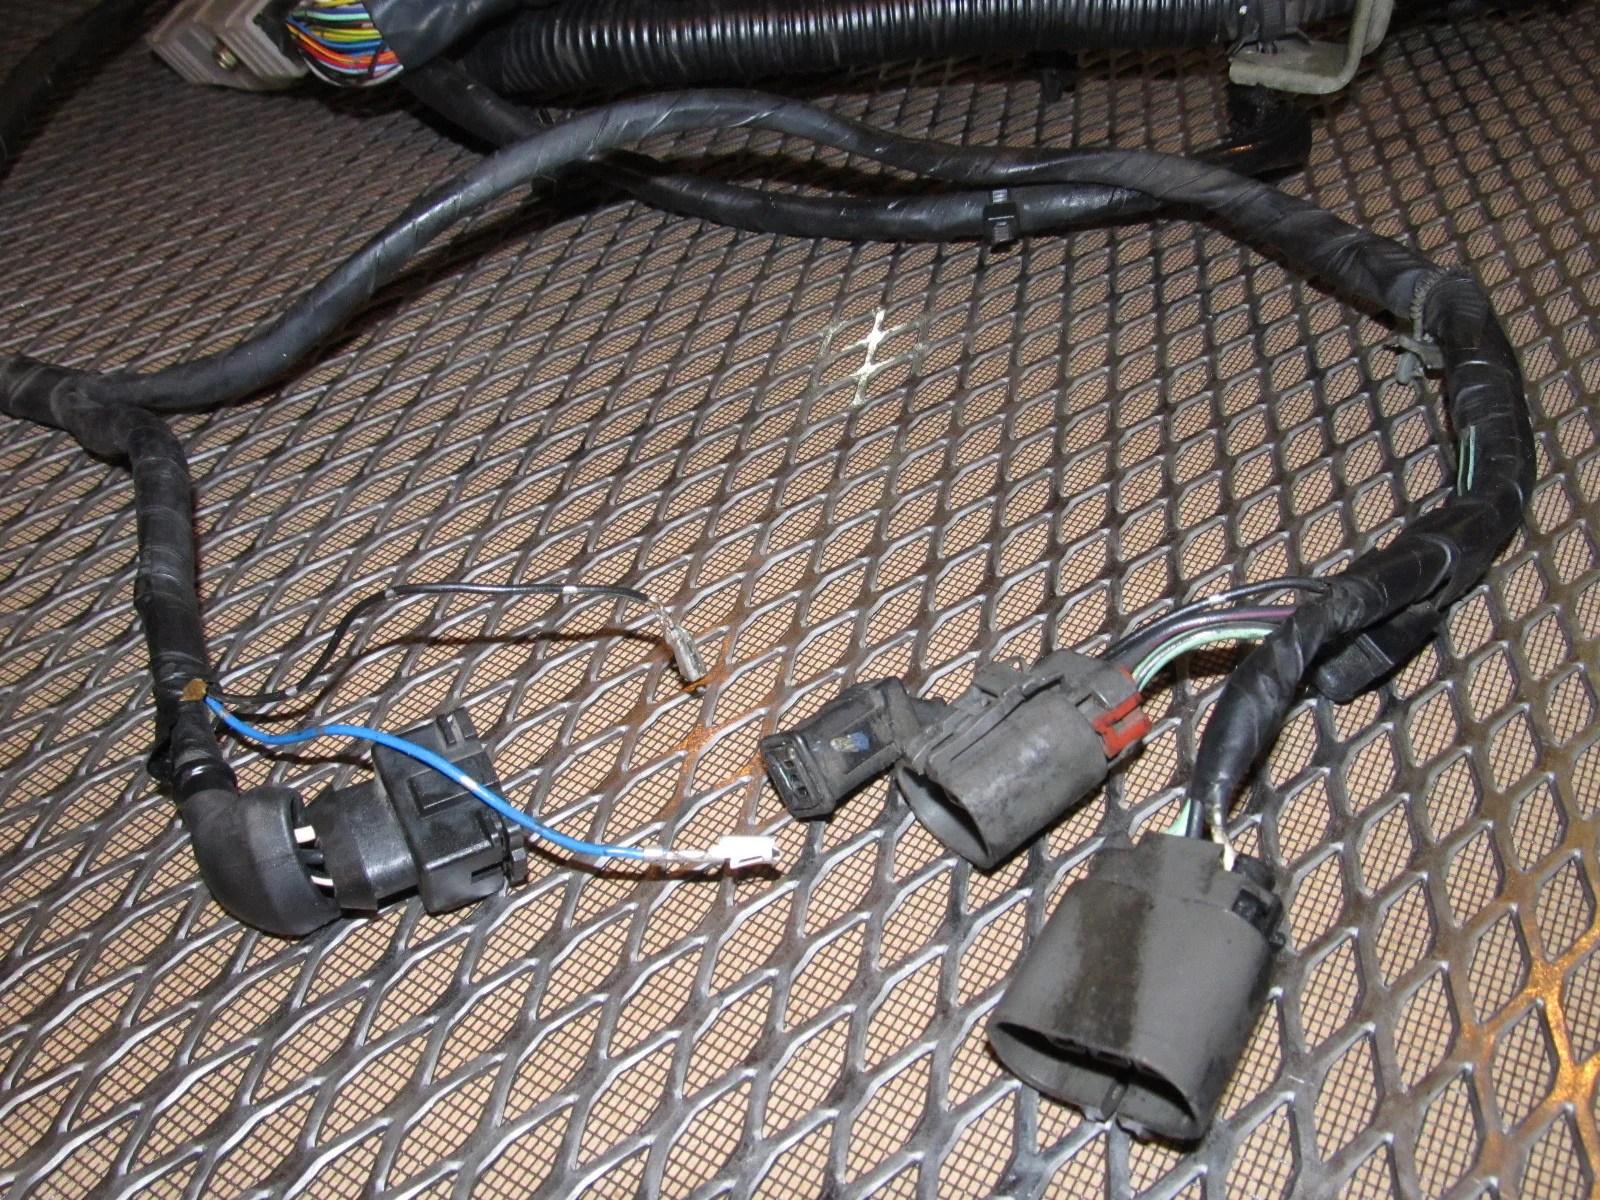 hight resolution of 89 90 nissan 240sx oem engine wiring harness ka24e m t radio wiring harness 89 90 nissan